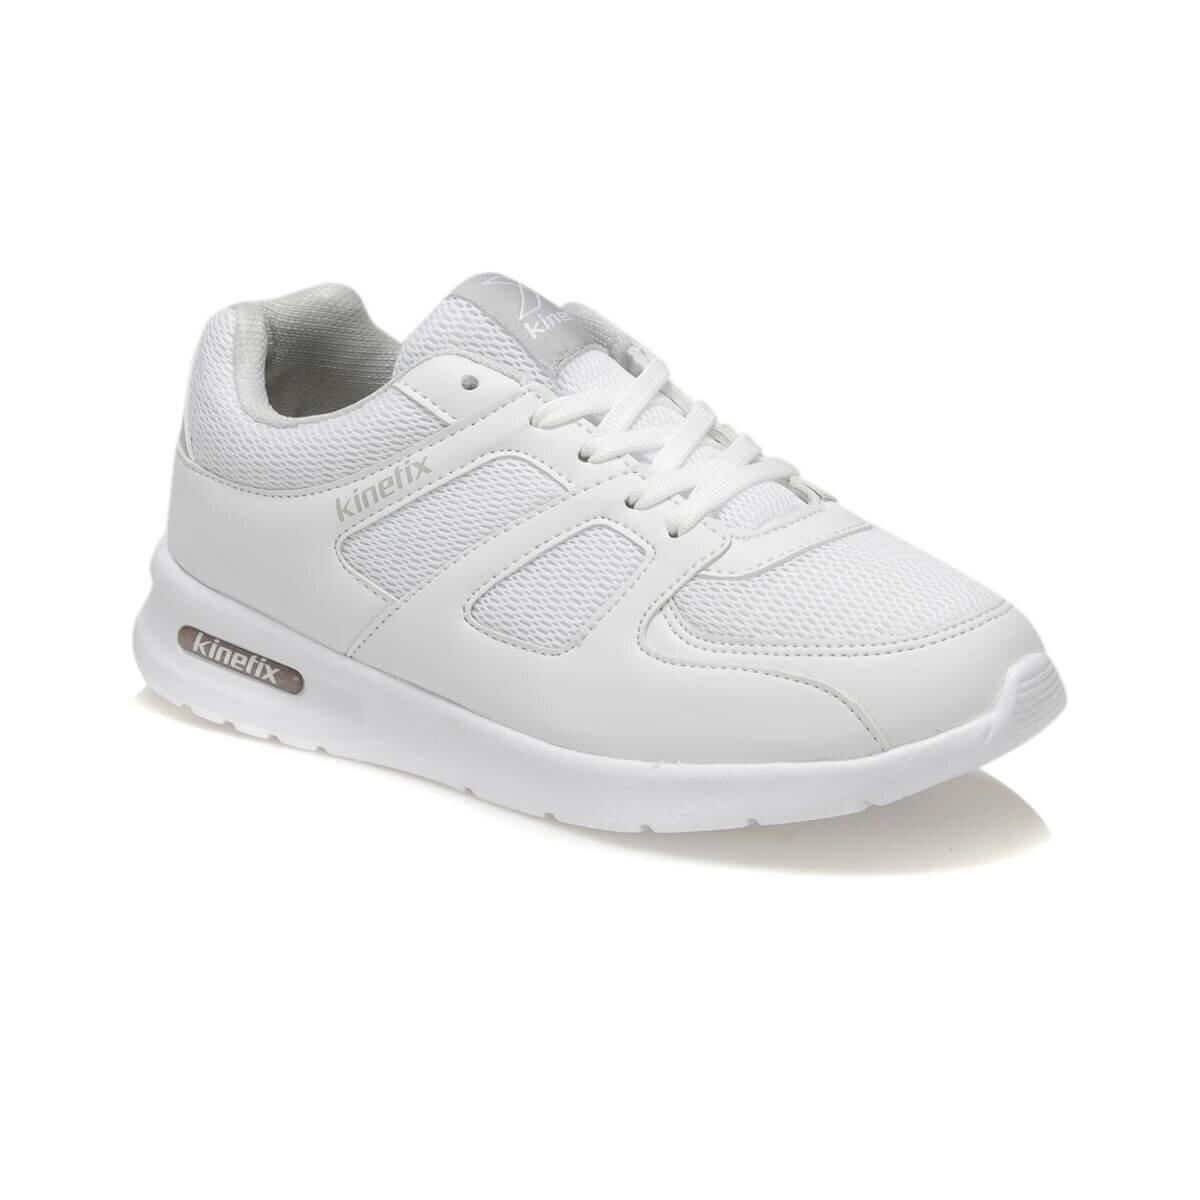 FLO White Women Sneaker Shoes Woman Sneakers White Platform Trainers Women Shoe Casual Tenis Feminino Zapatos De Mujer Zapatillas KINETIX KRISTY W